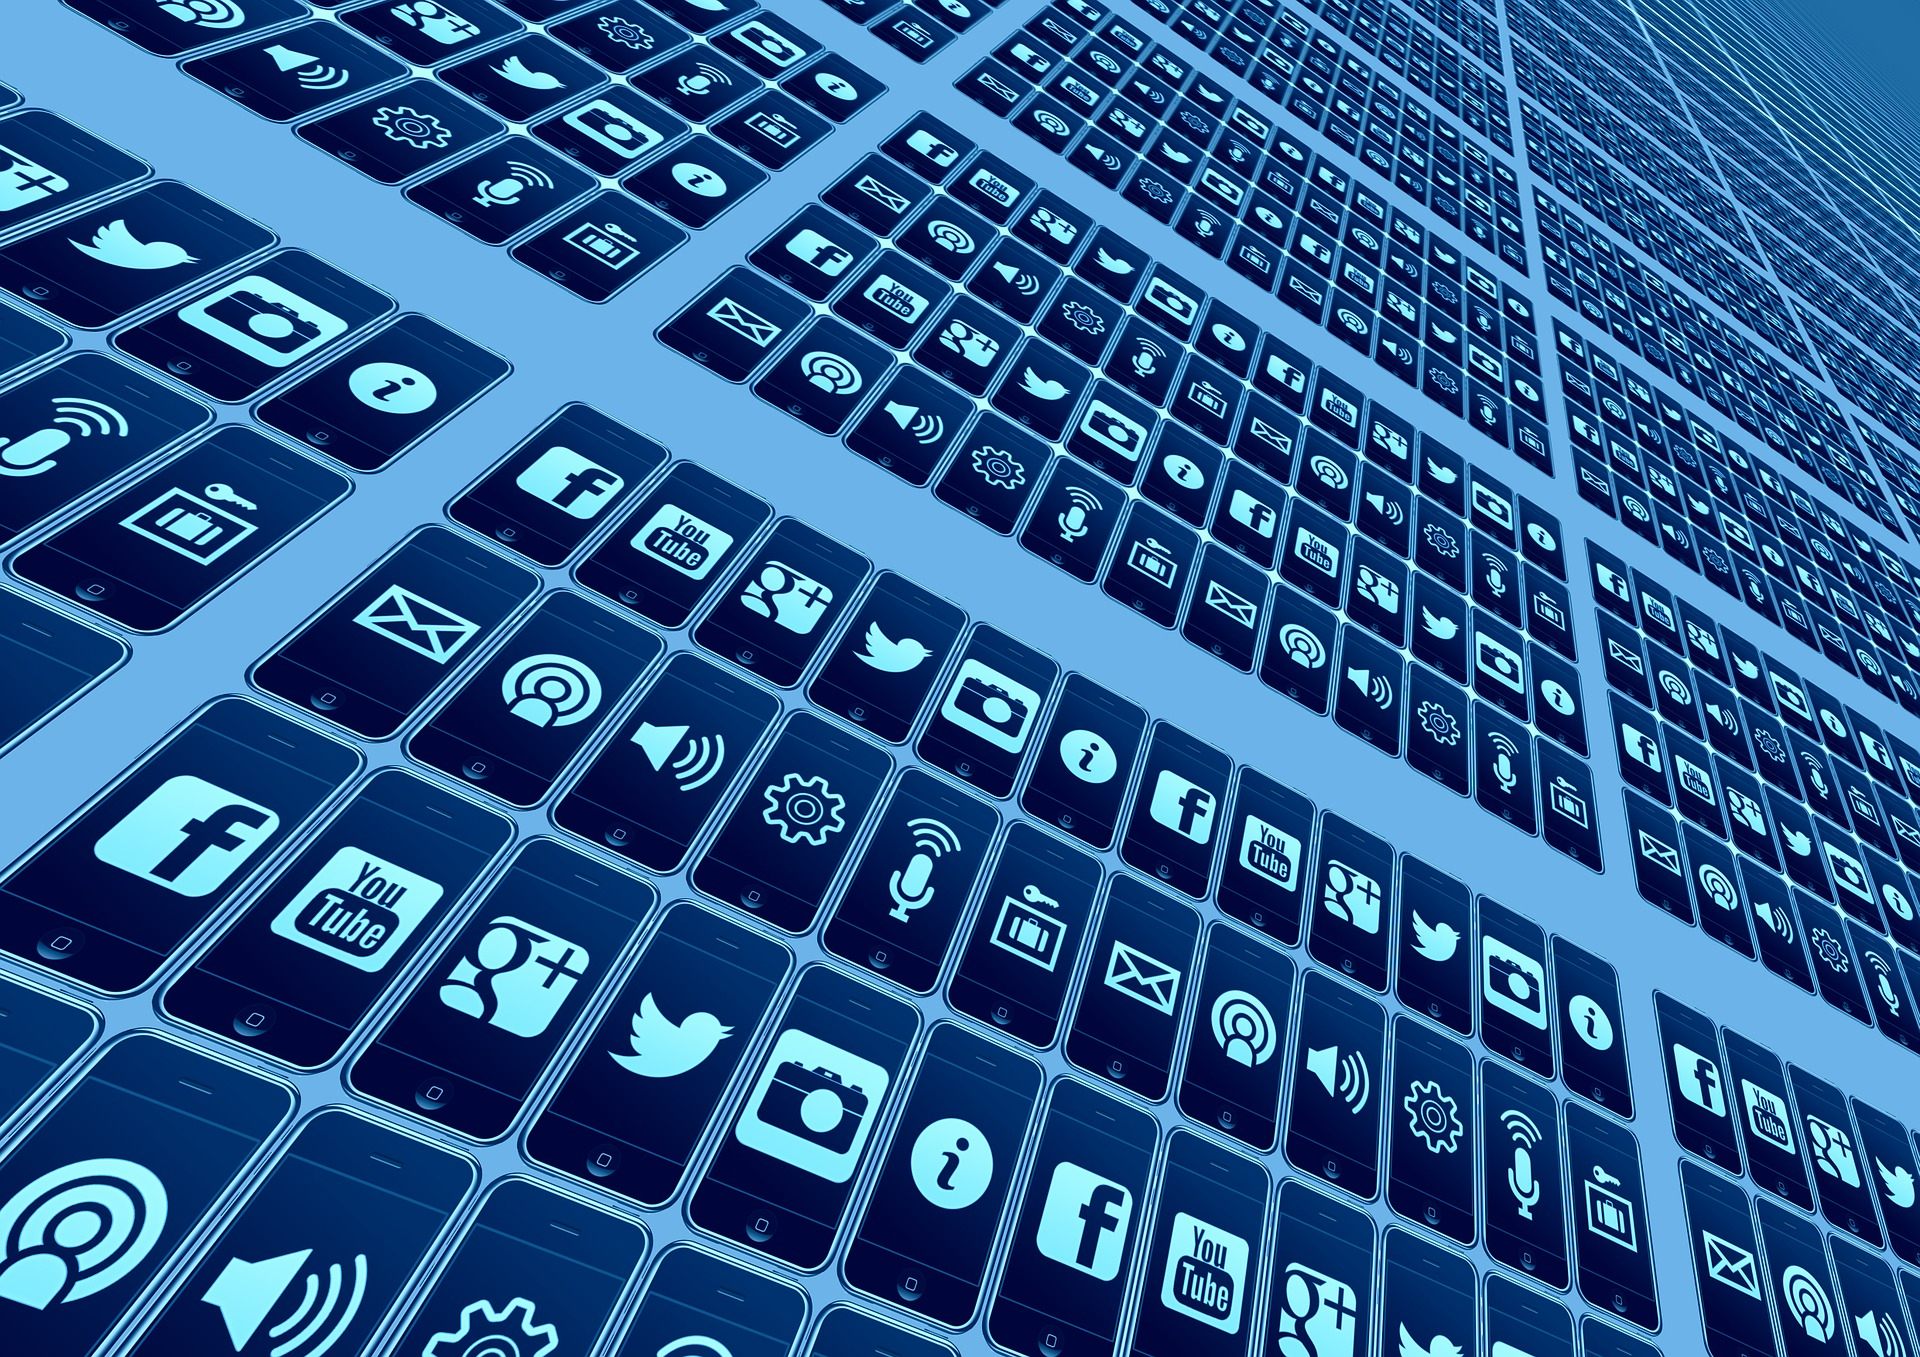 Crafting a Media List in the Digital Age